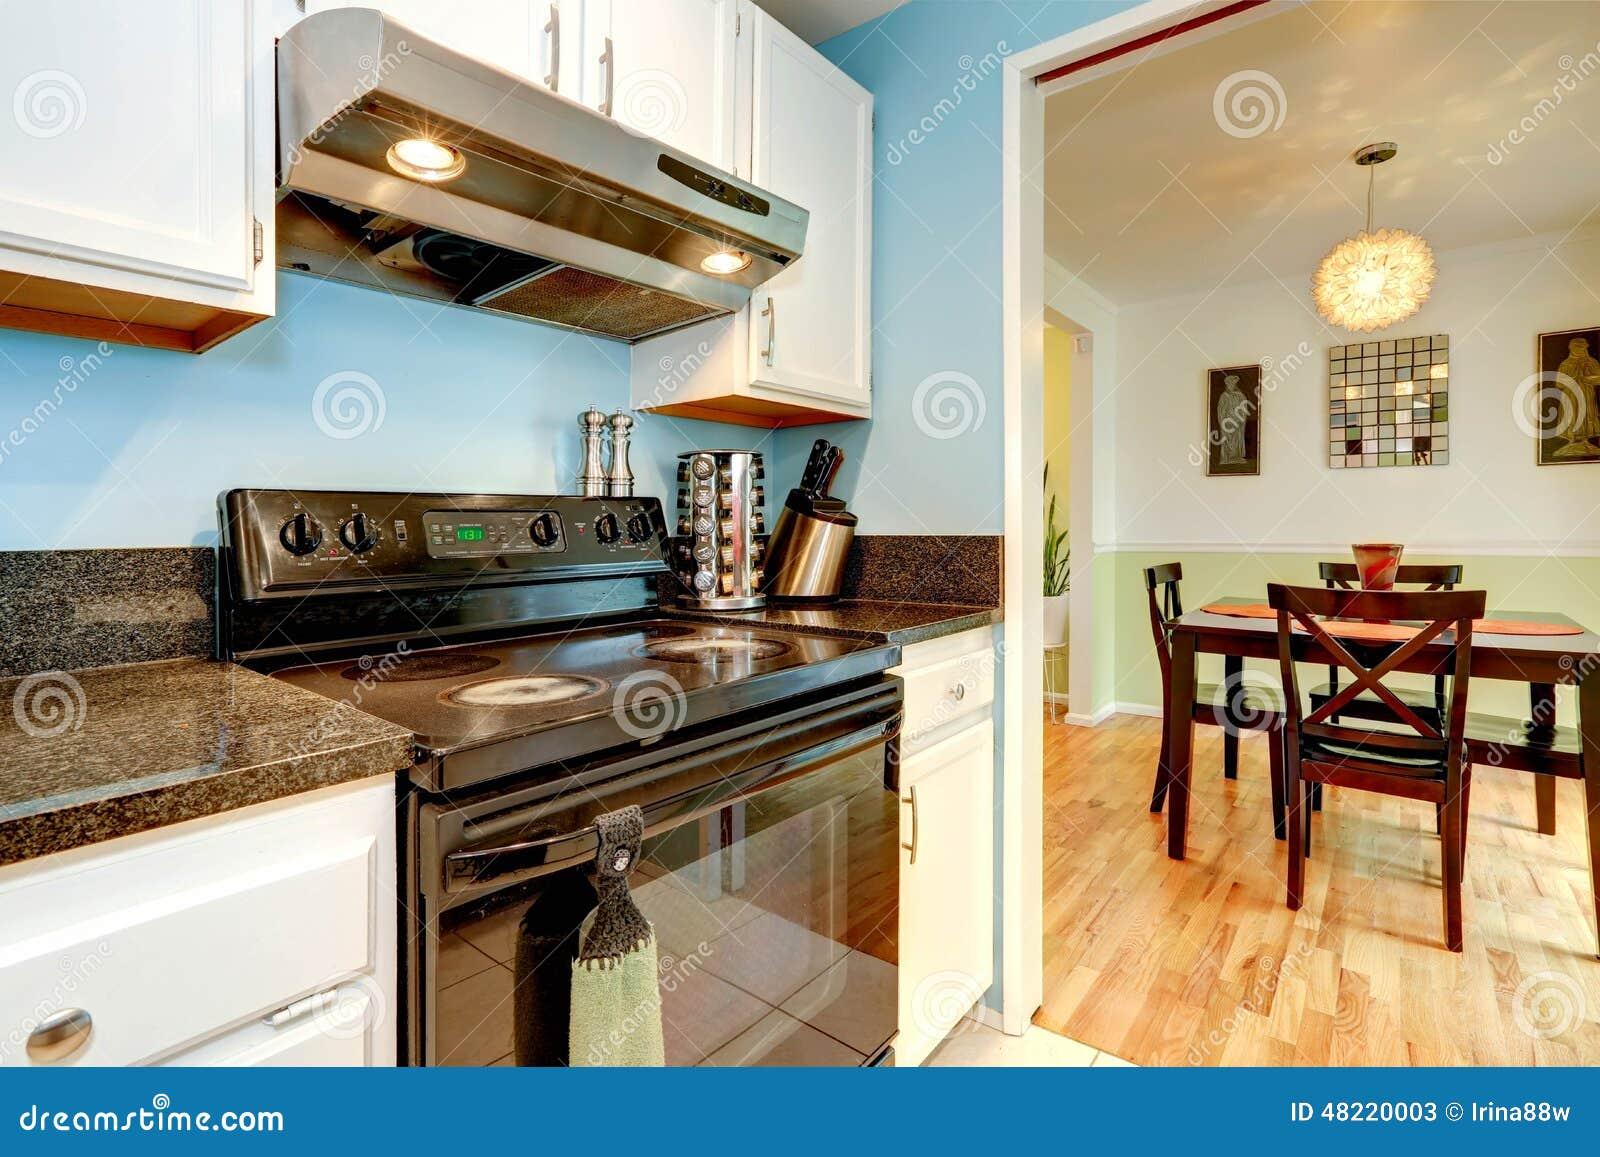 Zwart Keuken Fornuis : Witte keukenkasten met zwart fornuis stock afbeelding afbeelding